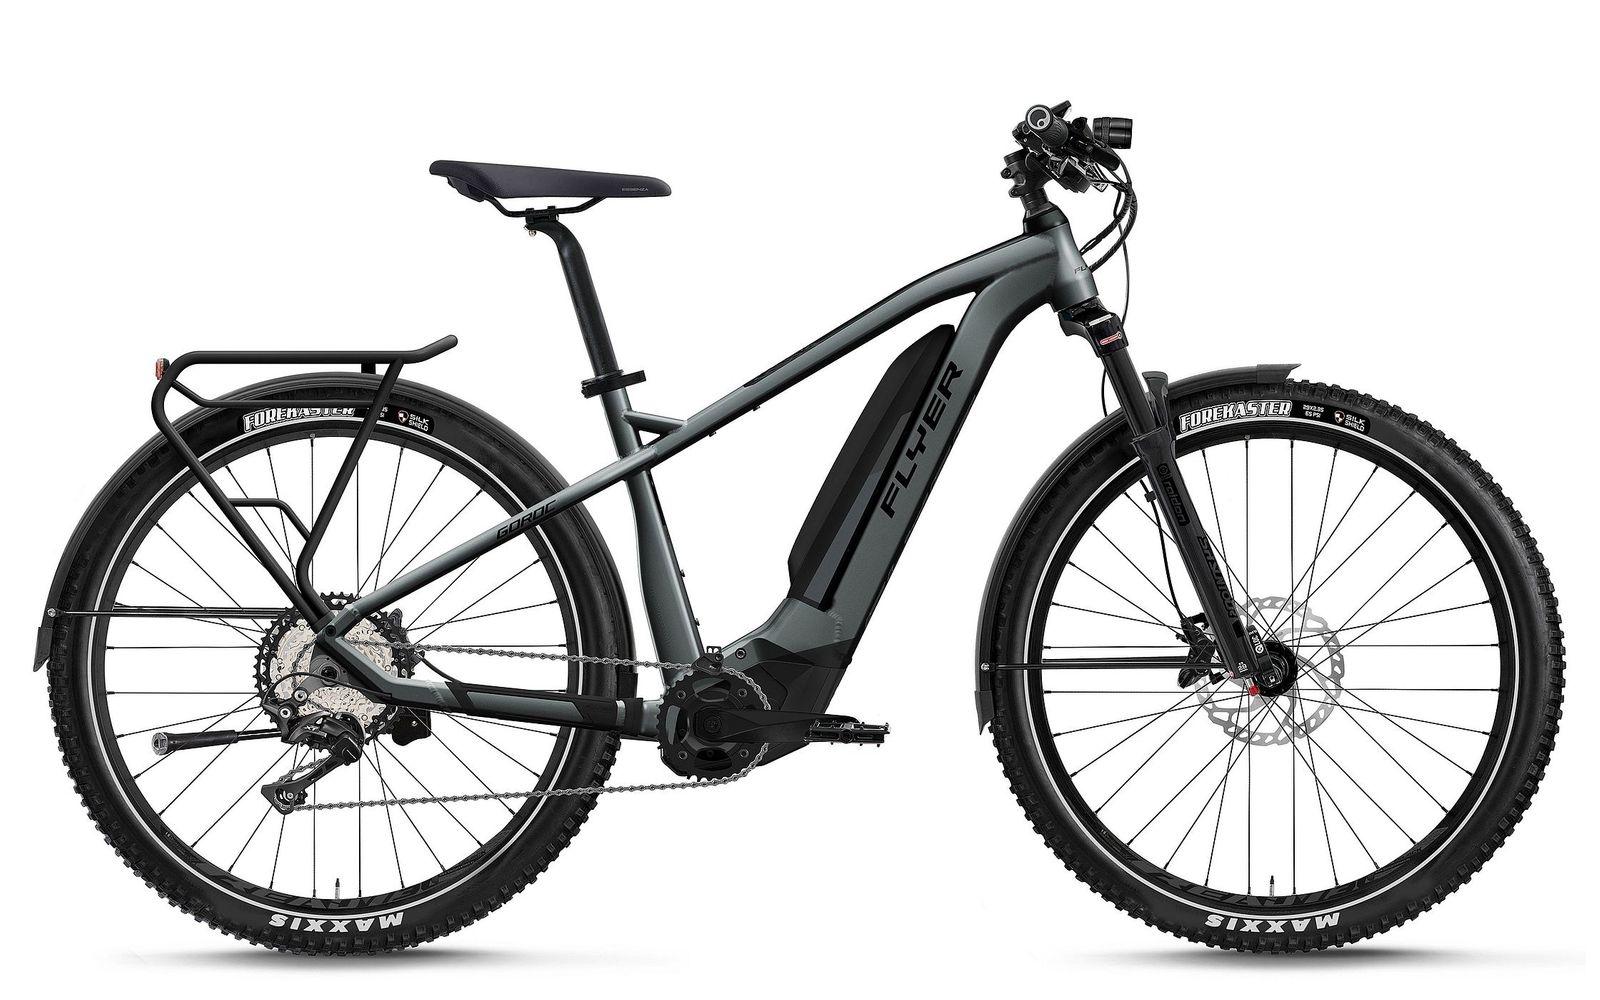 csm_FLYER_E-Bikes_MY21_Goroc2_430_Hardtail_BlackShadingBlackGloss_b60635d5f6